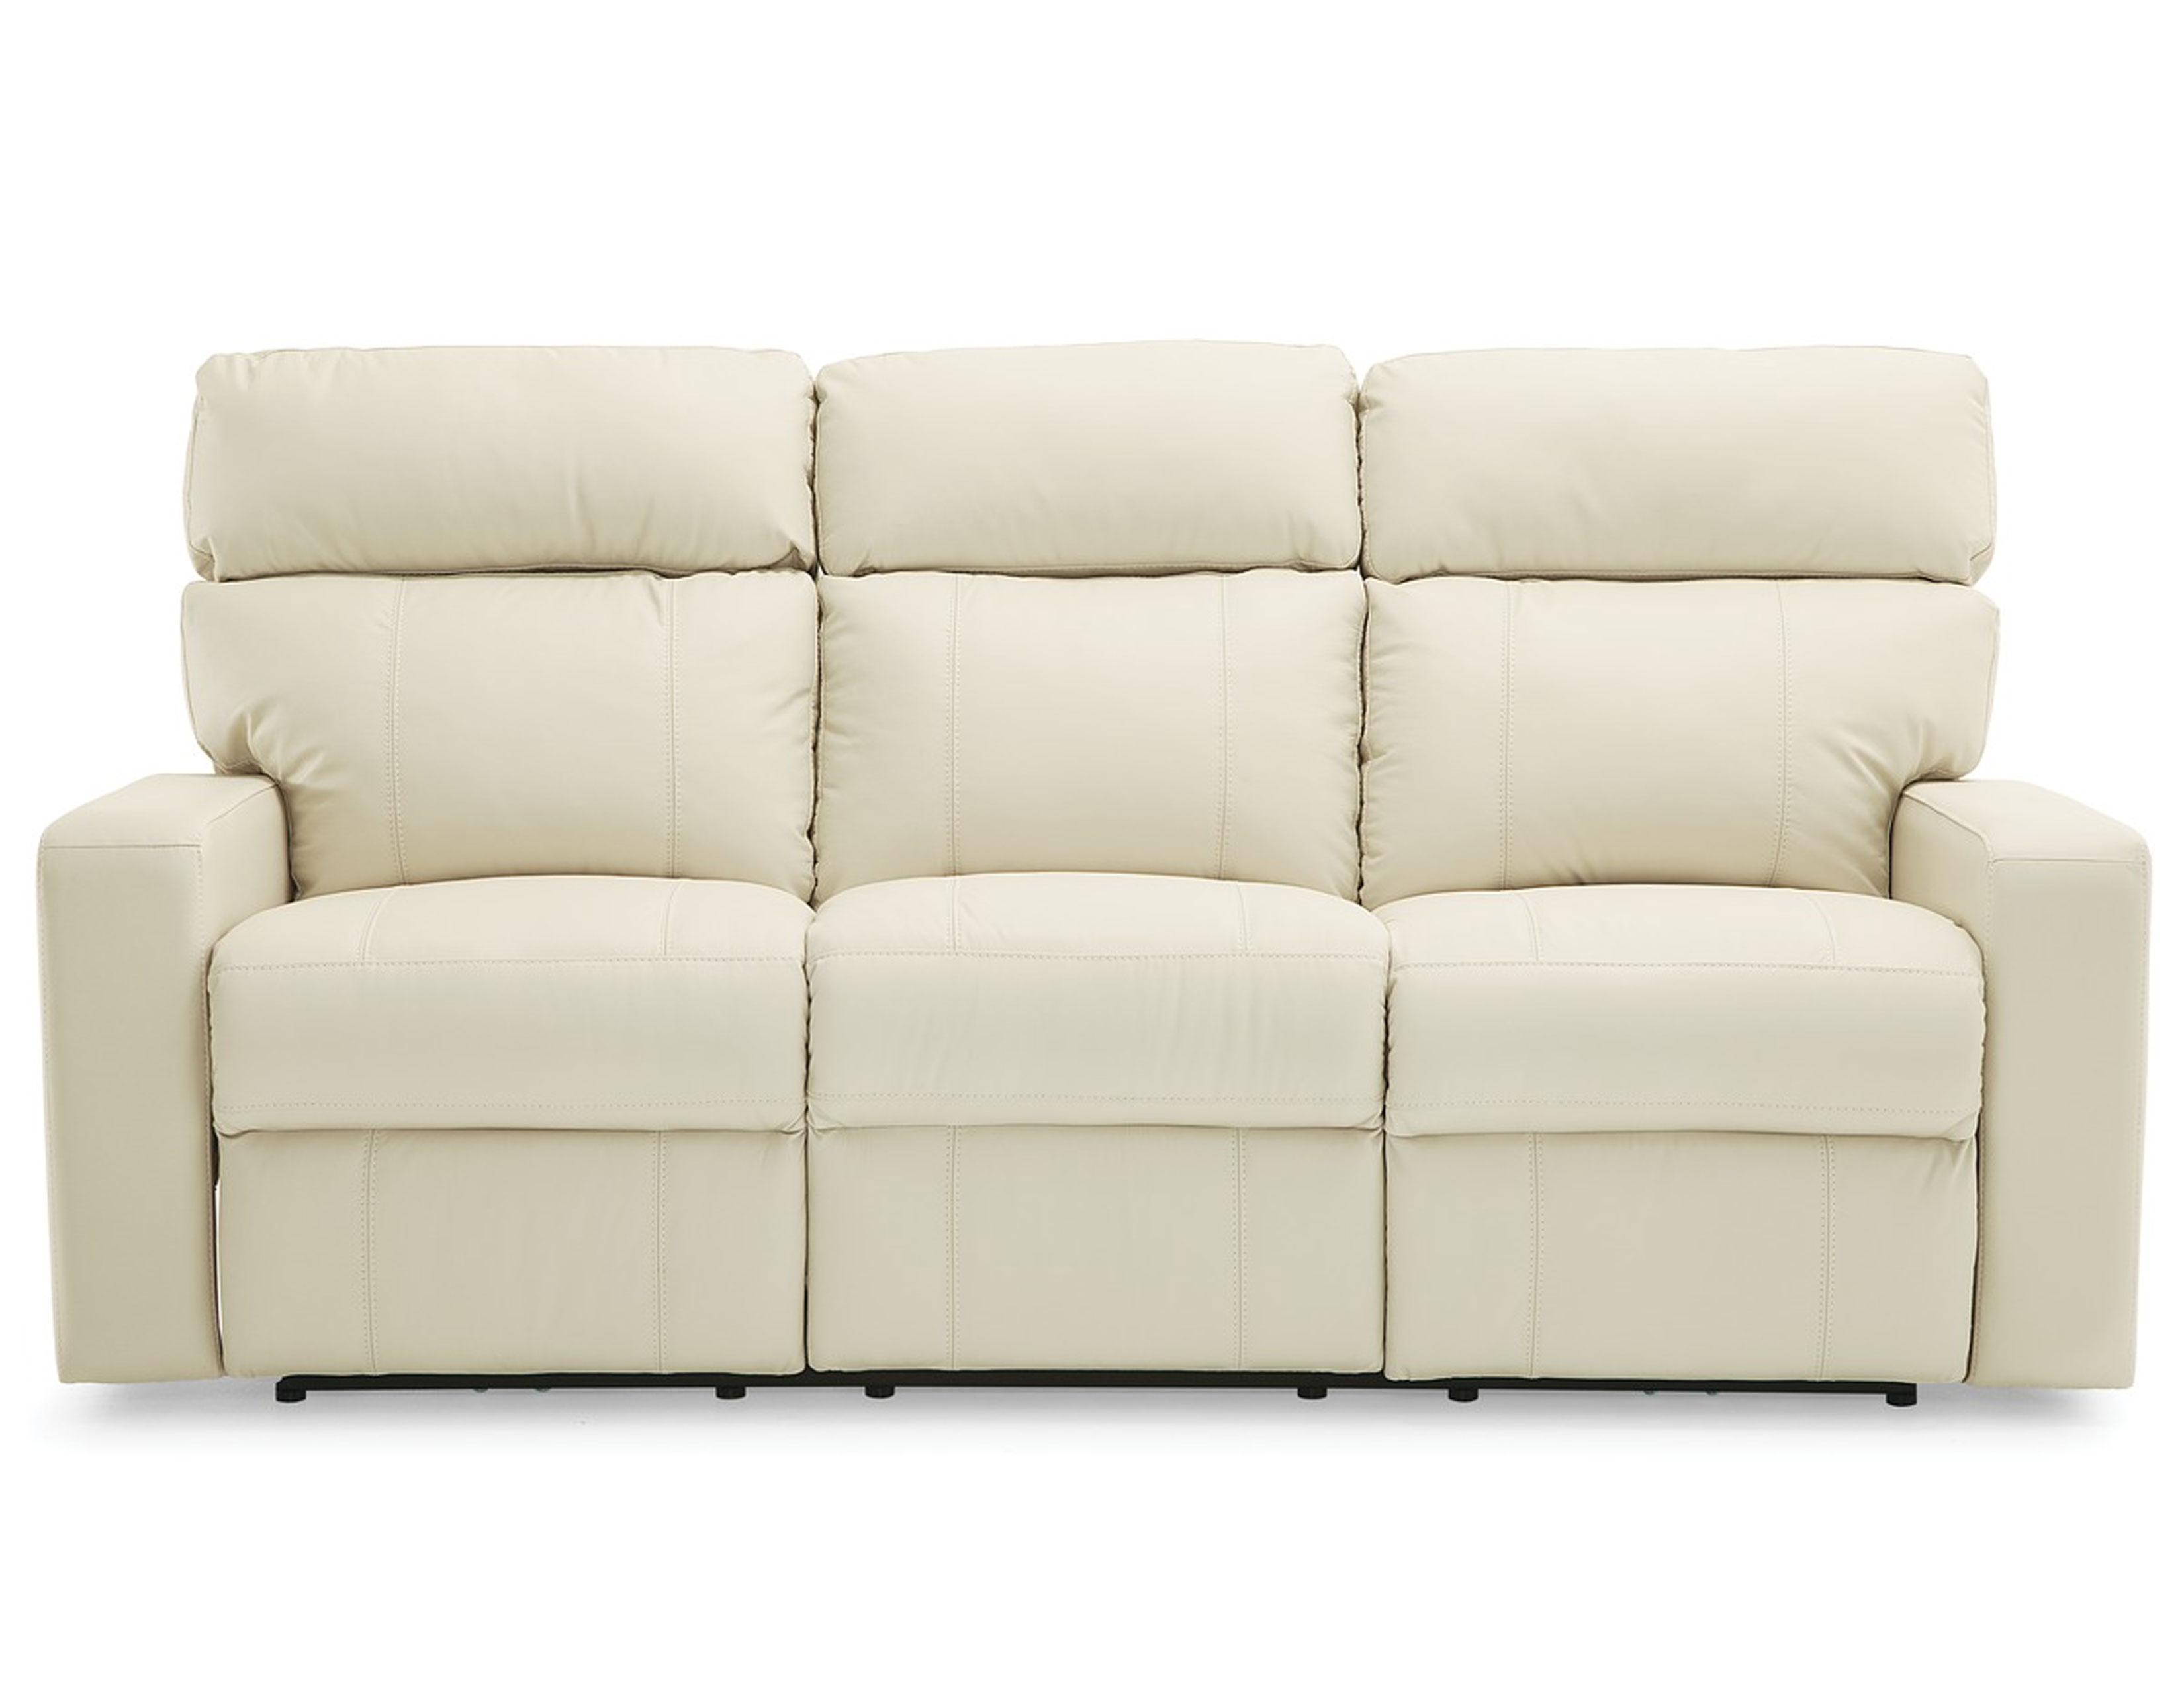 Astounding Oakwood Reclining Sofa Collection 350 Fabrics Sofas And Spiritservingveterans Wood Chair Design Ideas Spiritservingveteransorg